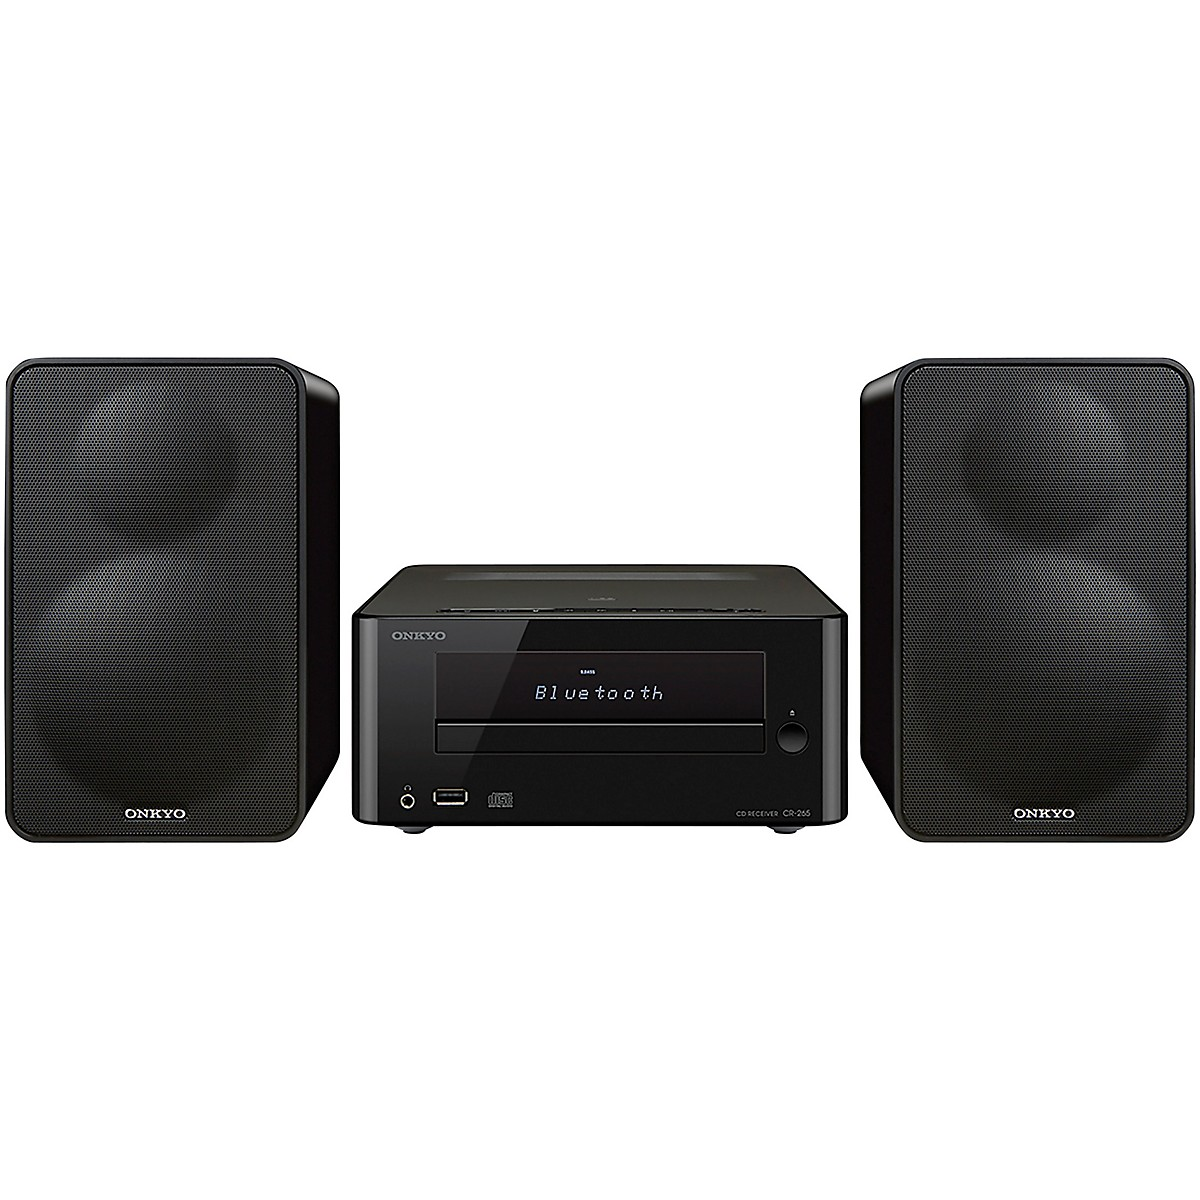 Onkyo Colibrino CD Hi-Fi Mini System with Bluetooth